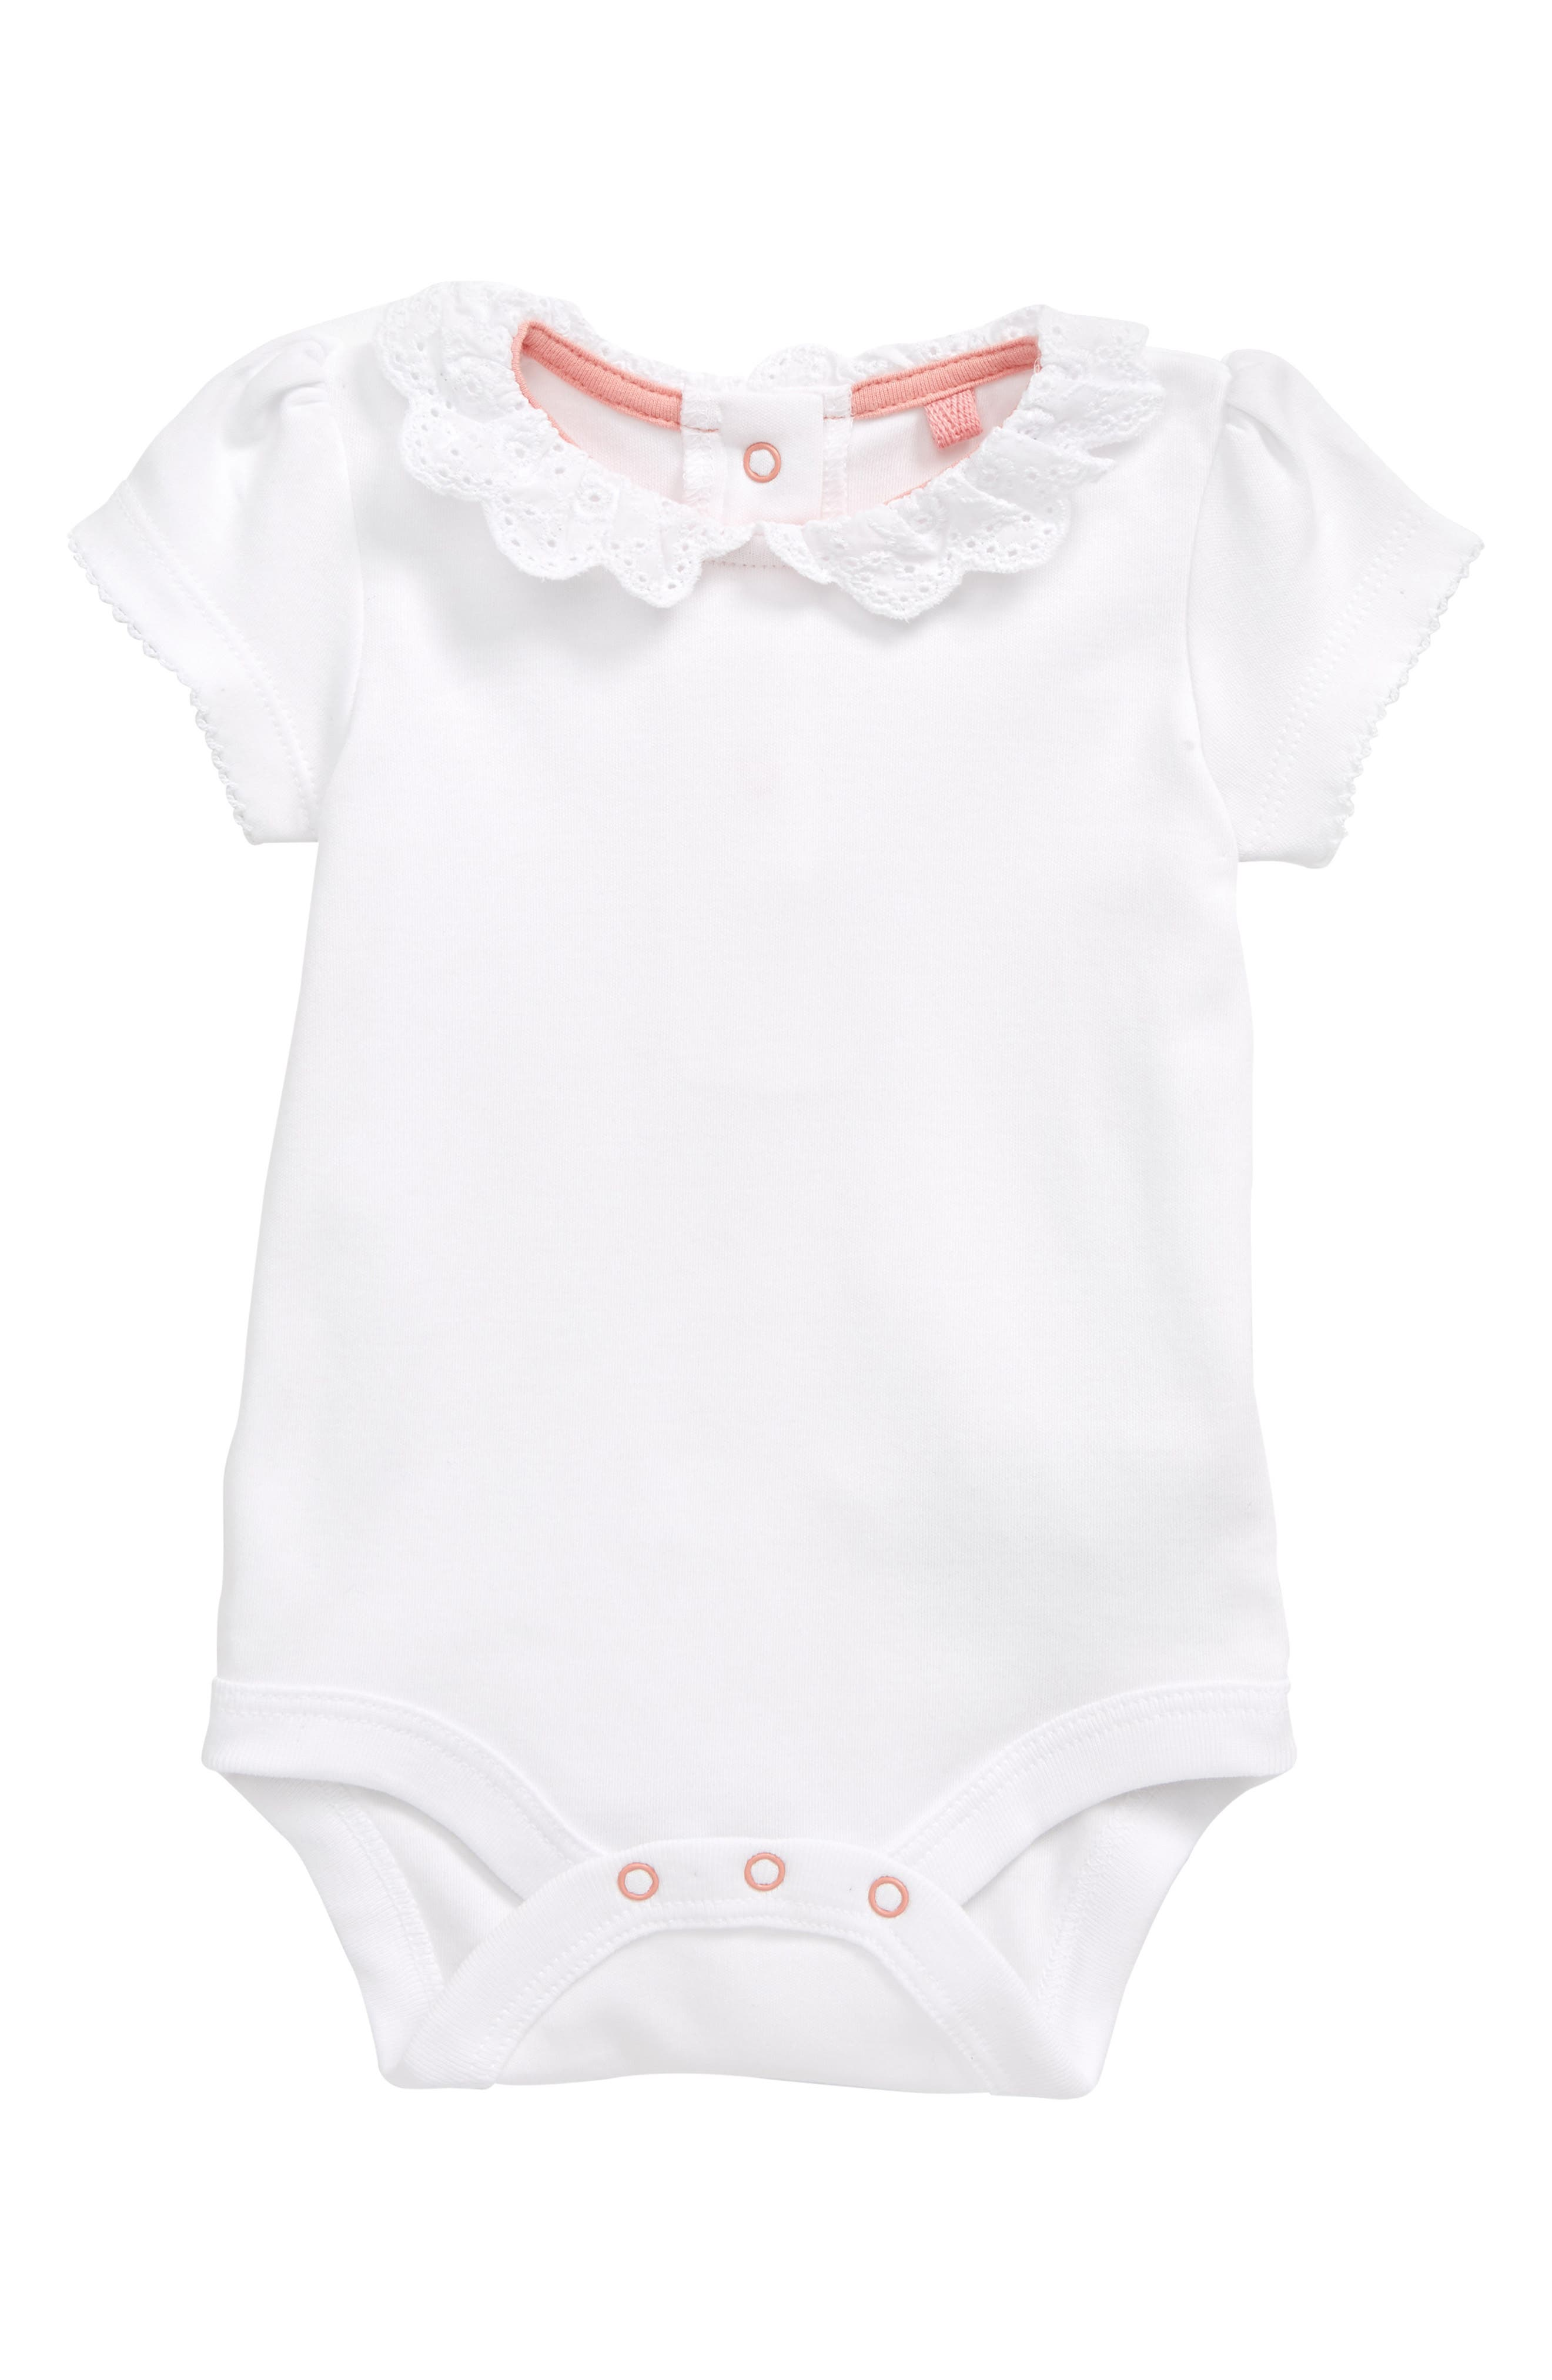 size 12-18 Baby Boden Infant  Bodysuits